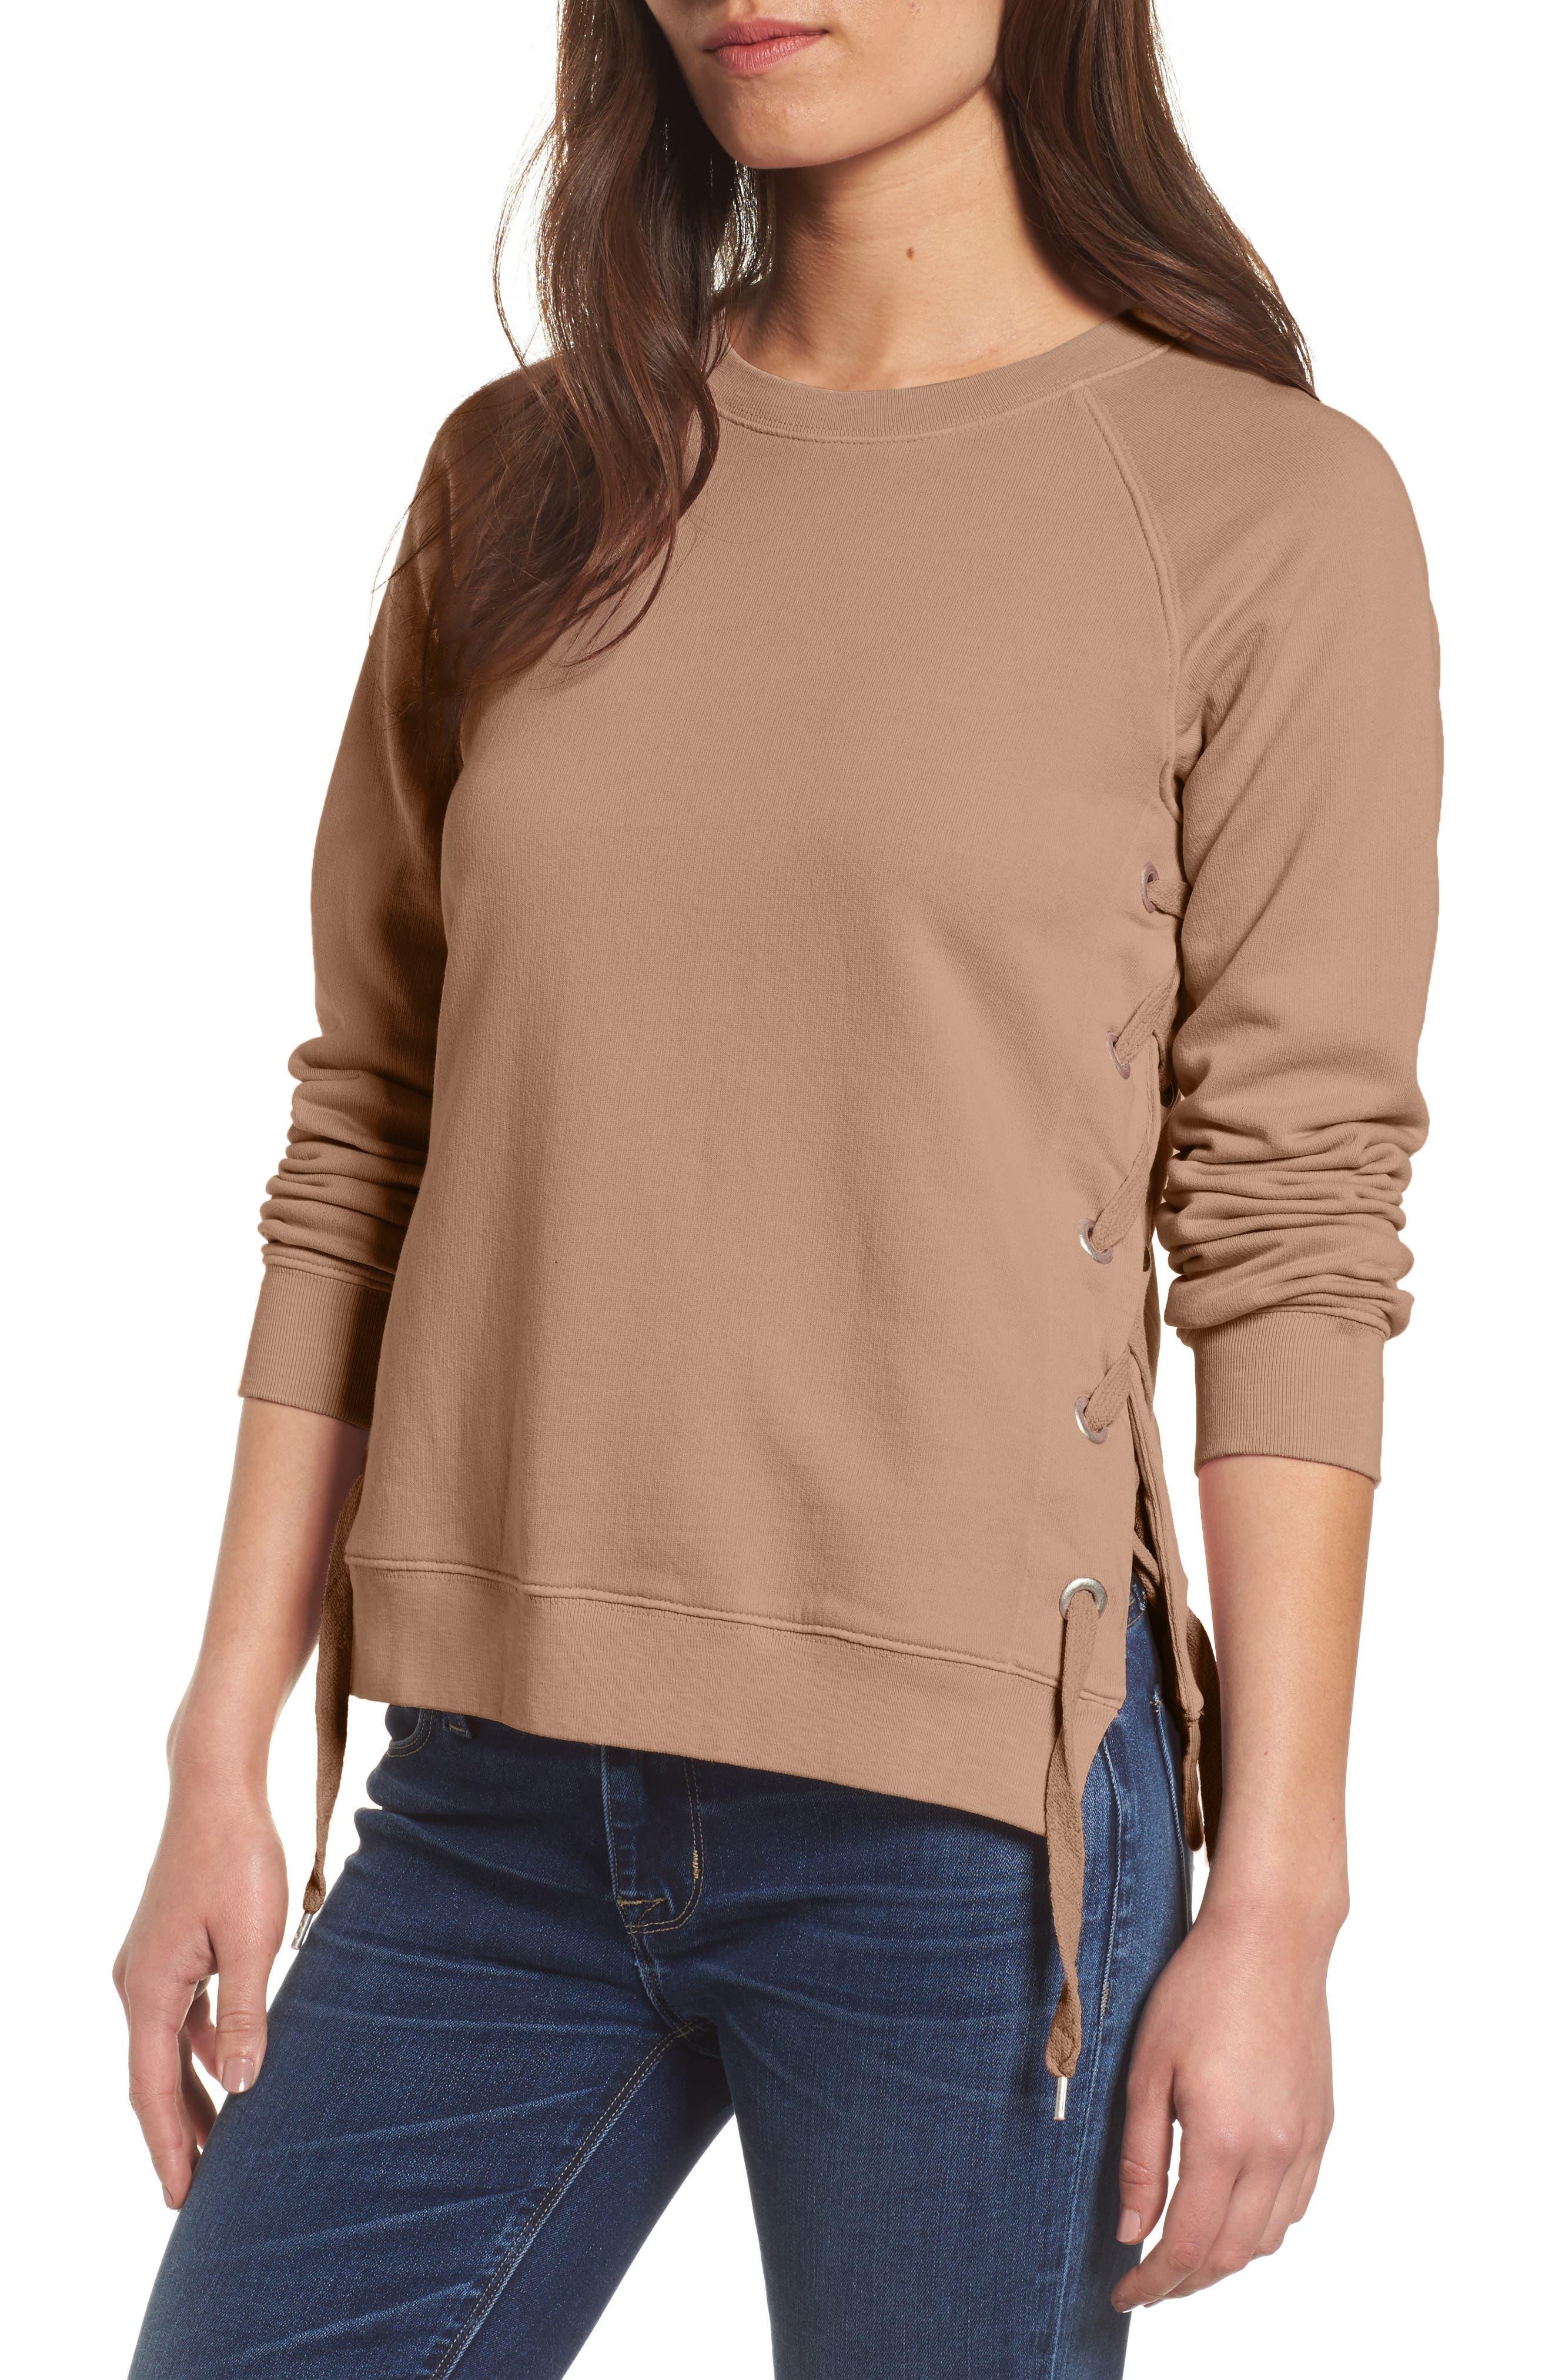 Sincerely Jules Side-Lace Sweatshirt